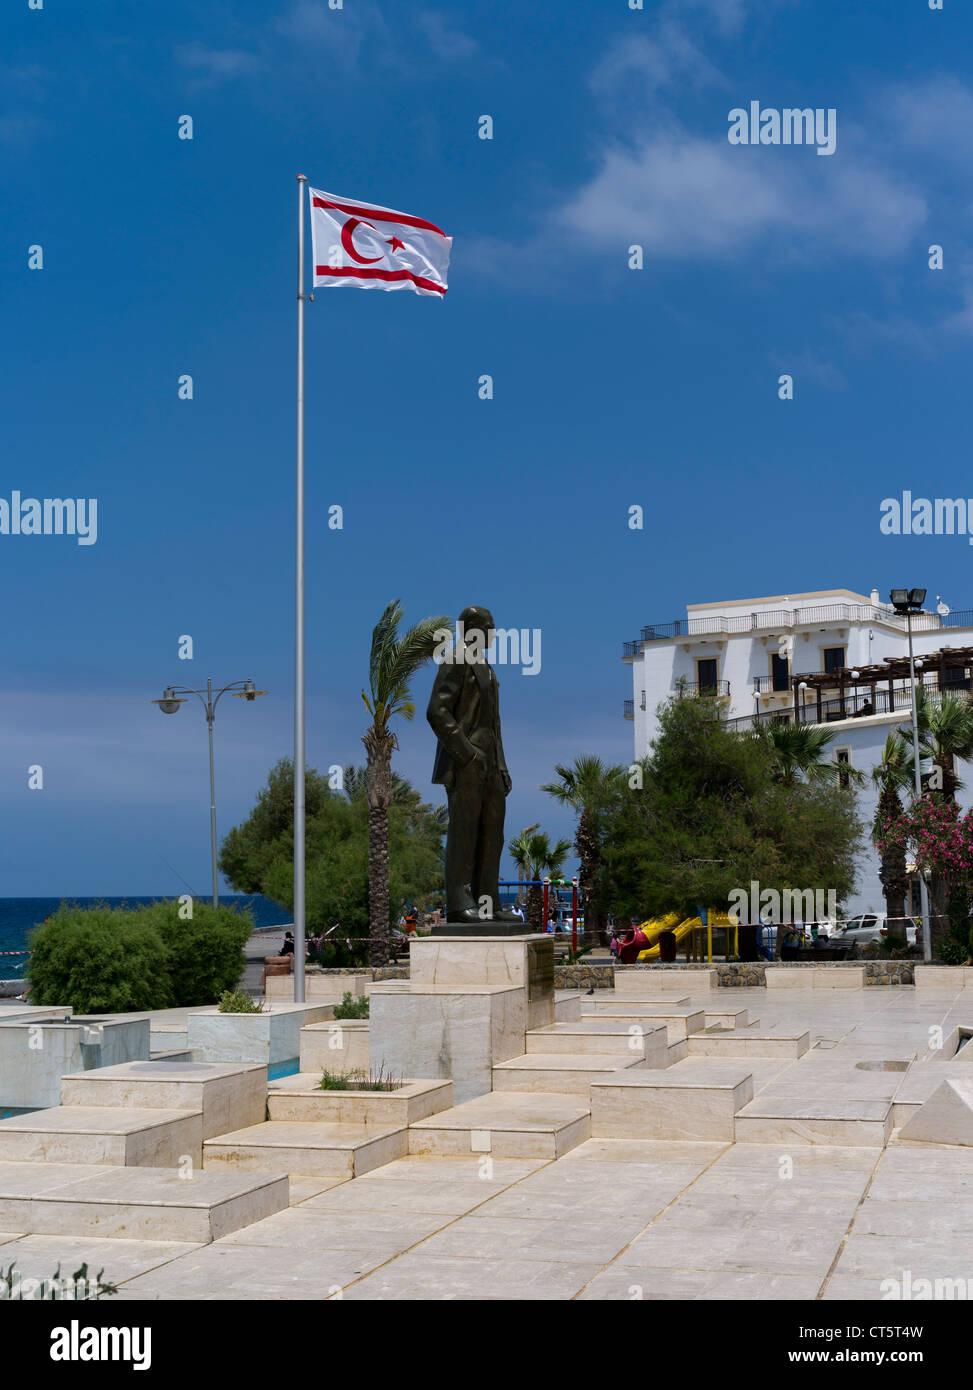 dh Mustafa Kemal Ataturk statue KYRENIA NORTHERN CYPRUS Flag Turkish republic of Northern Cyprus north - Stock Image